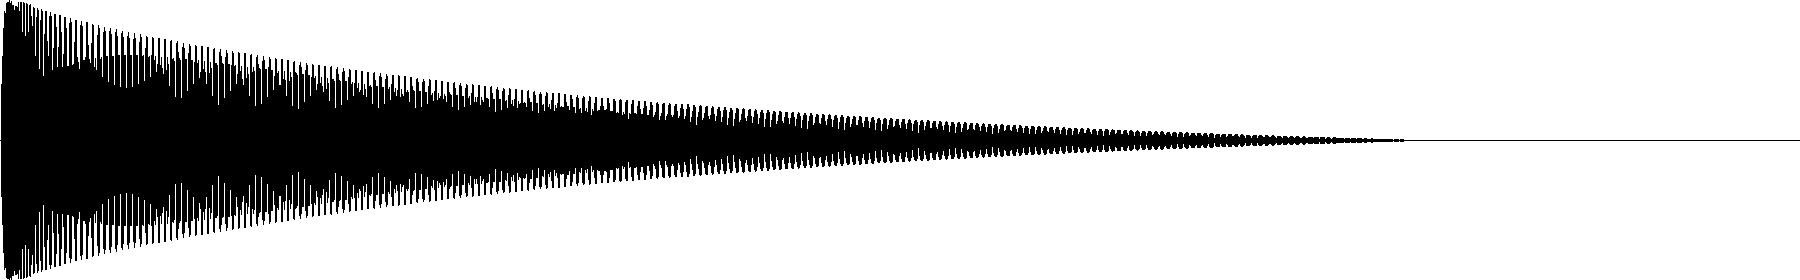 808 bass fm gowers edition fm8 001